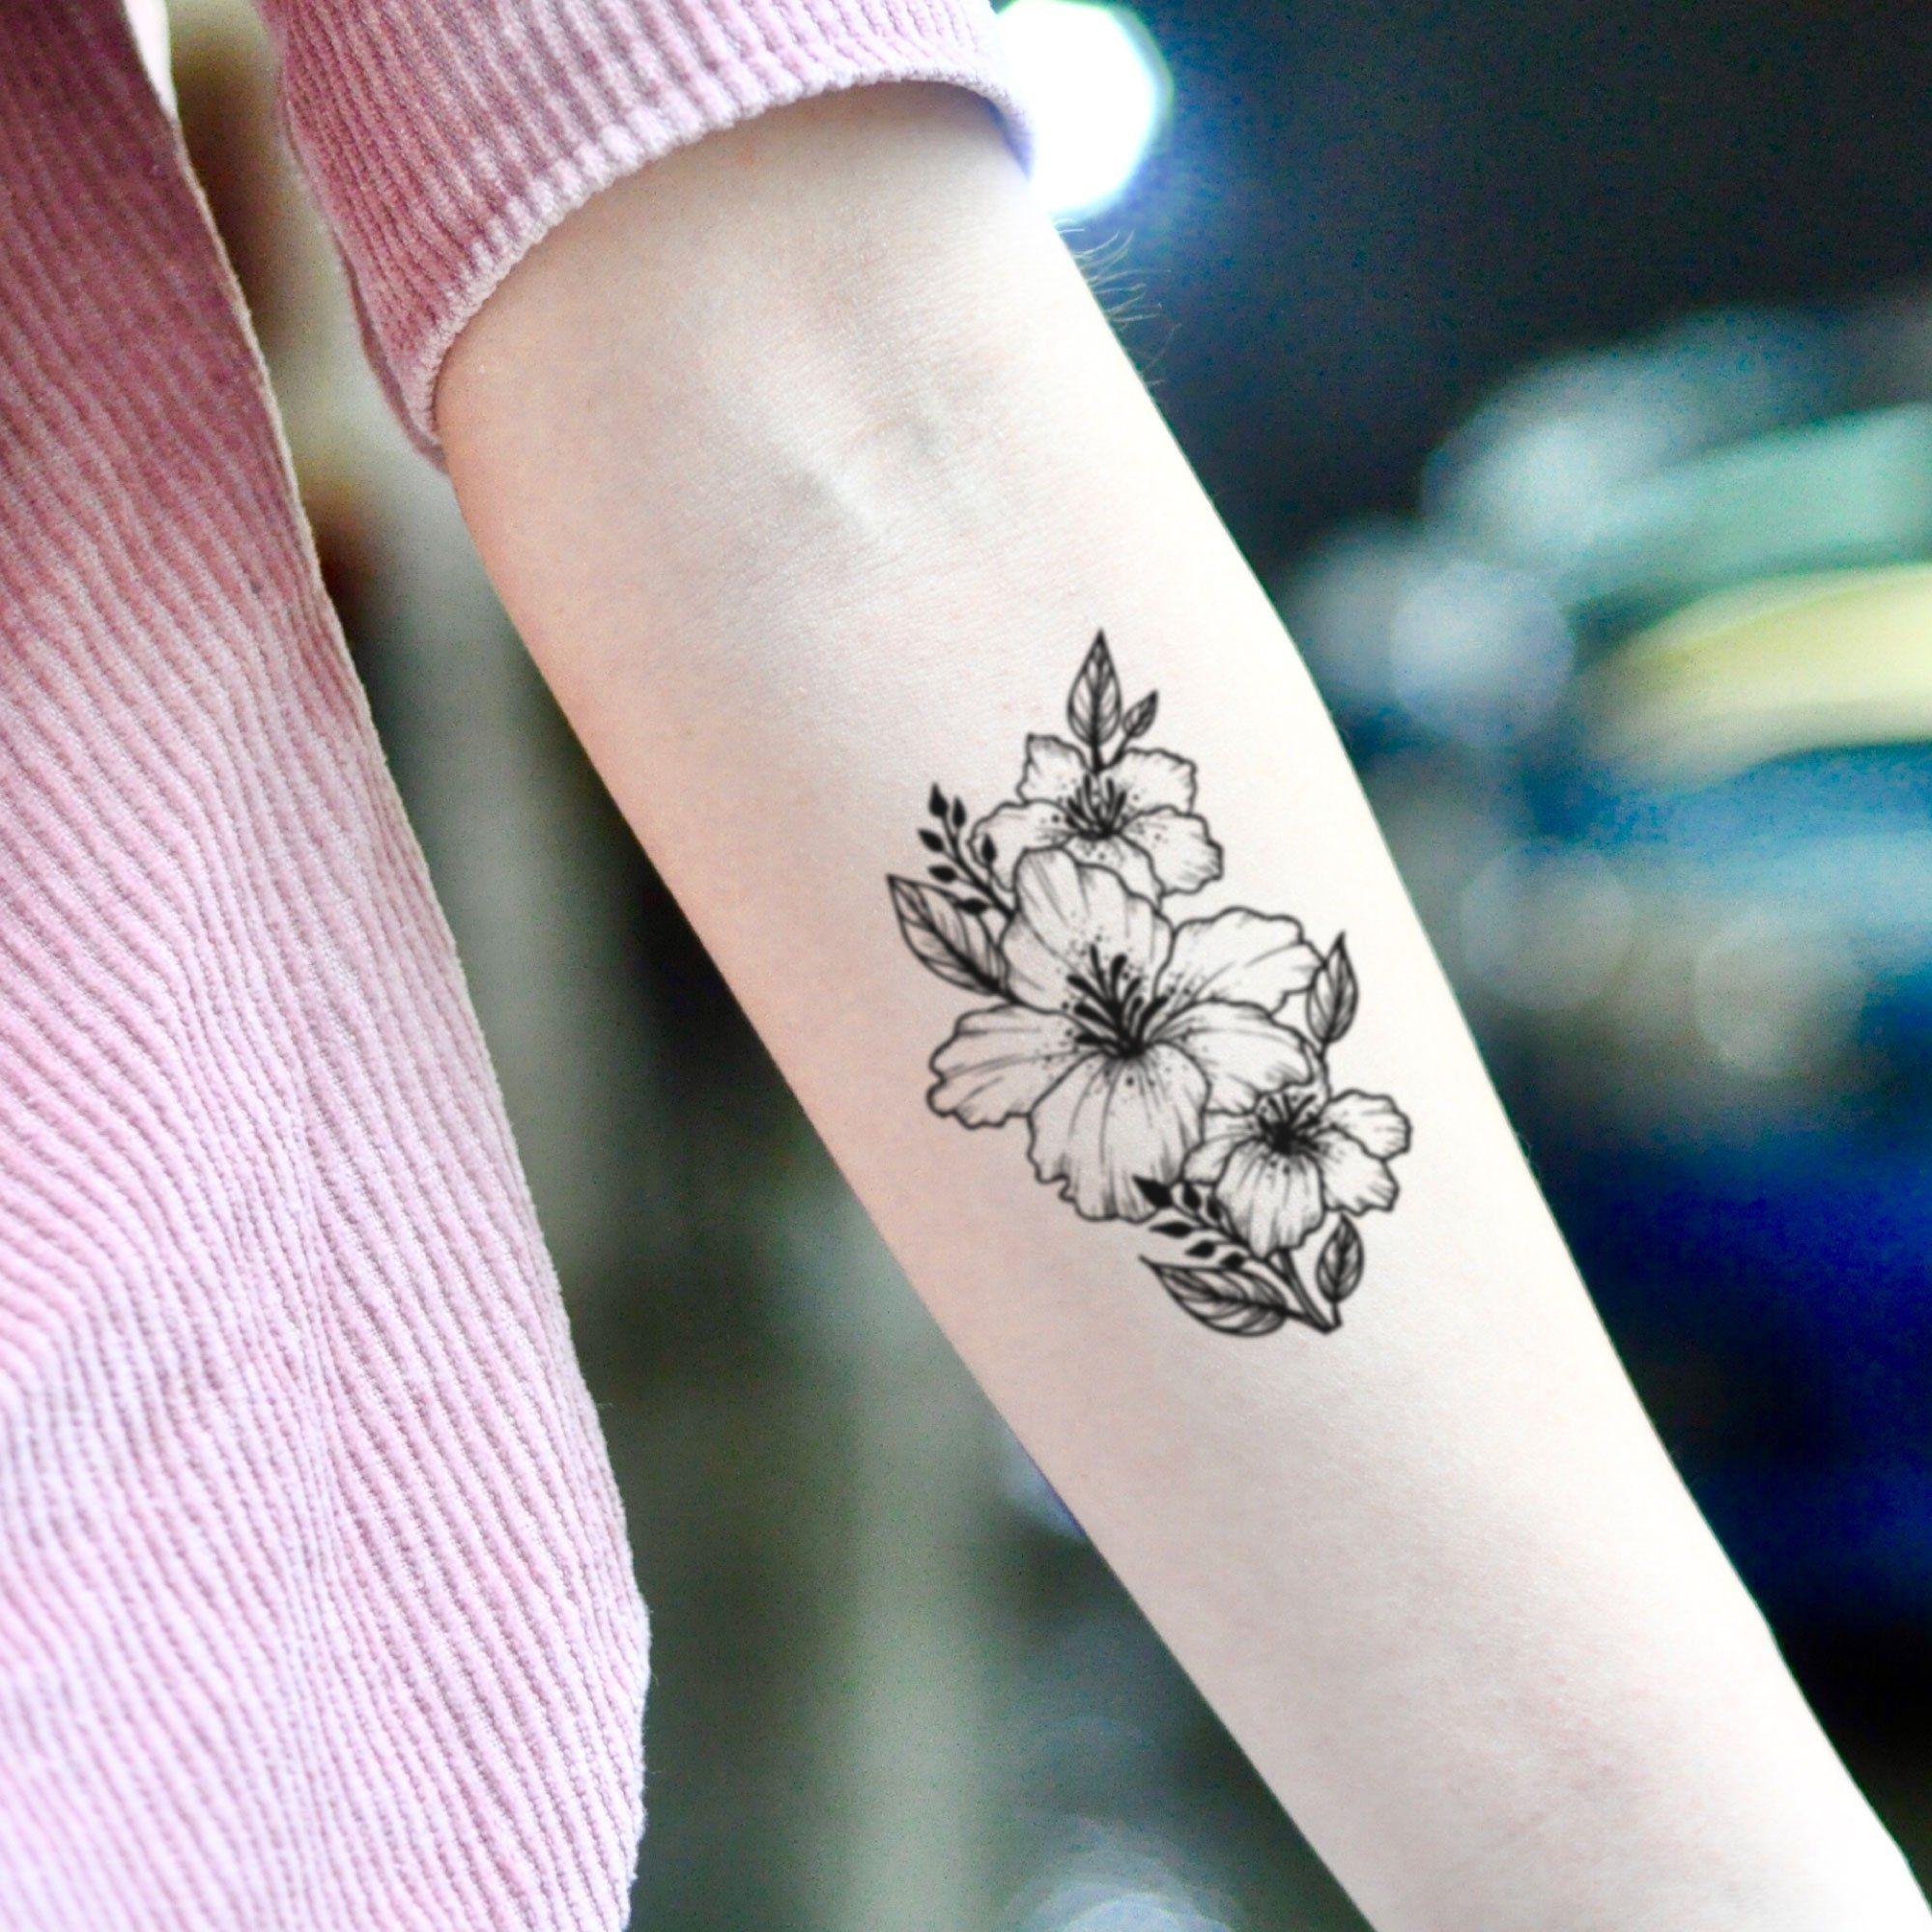 Azalea Temporary Tattoo Sticker Set Of 2 In 2020 Black Flowers Tattoo Tattoos Tattoo Stickers